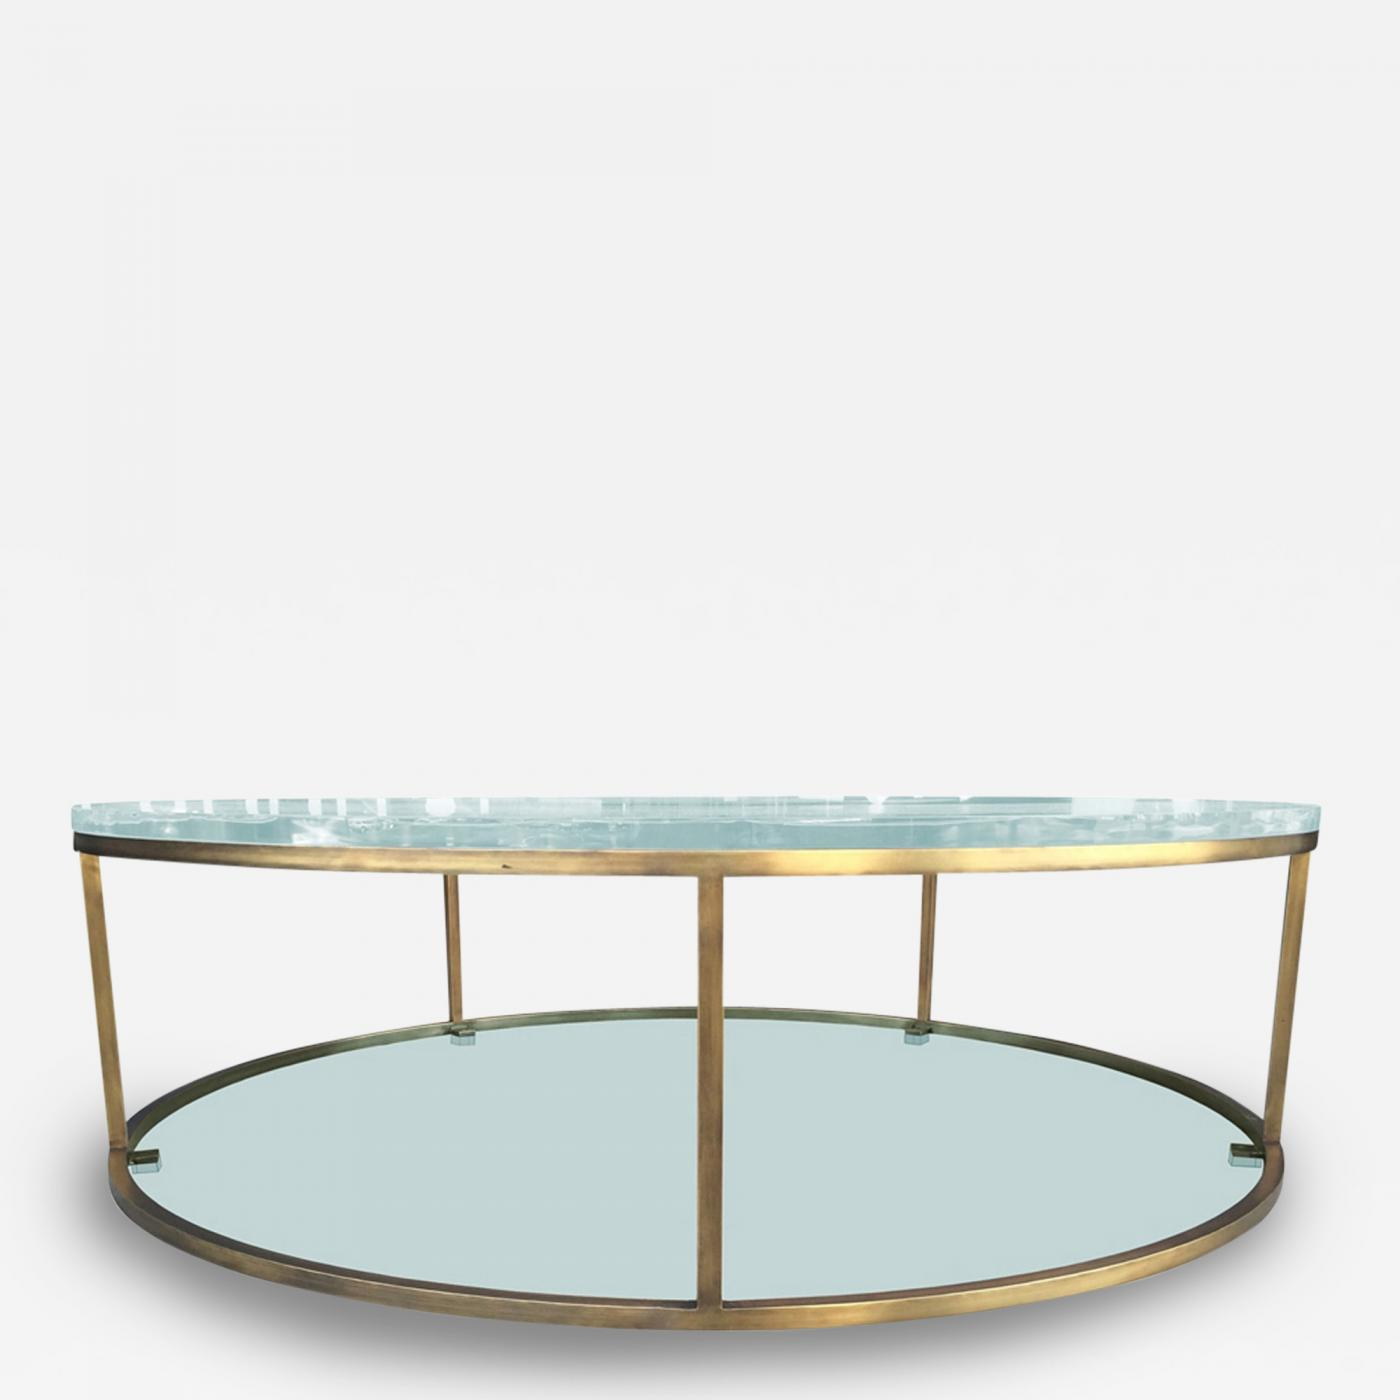 Amparo Calderon Tapia Two Level Coffee Table Aro II By Amparo - Two level coffee table